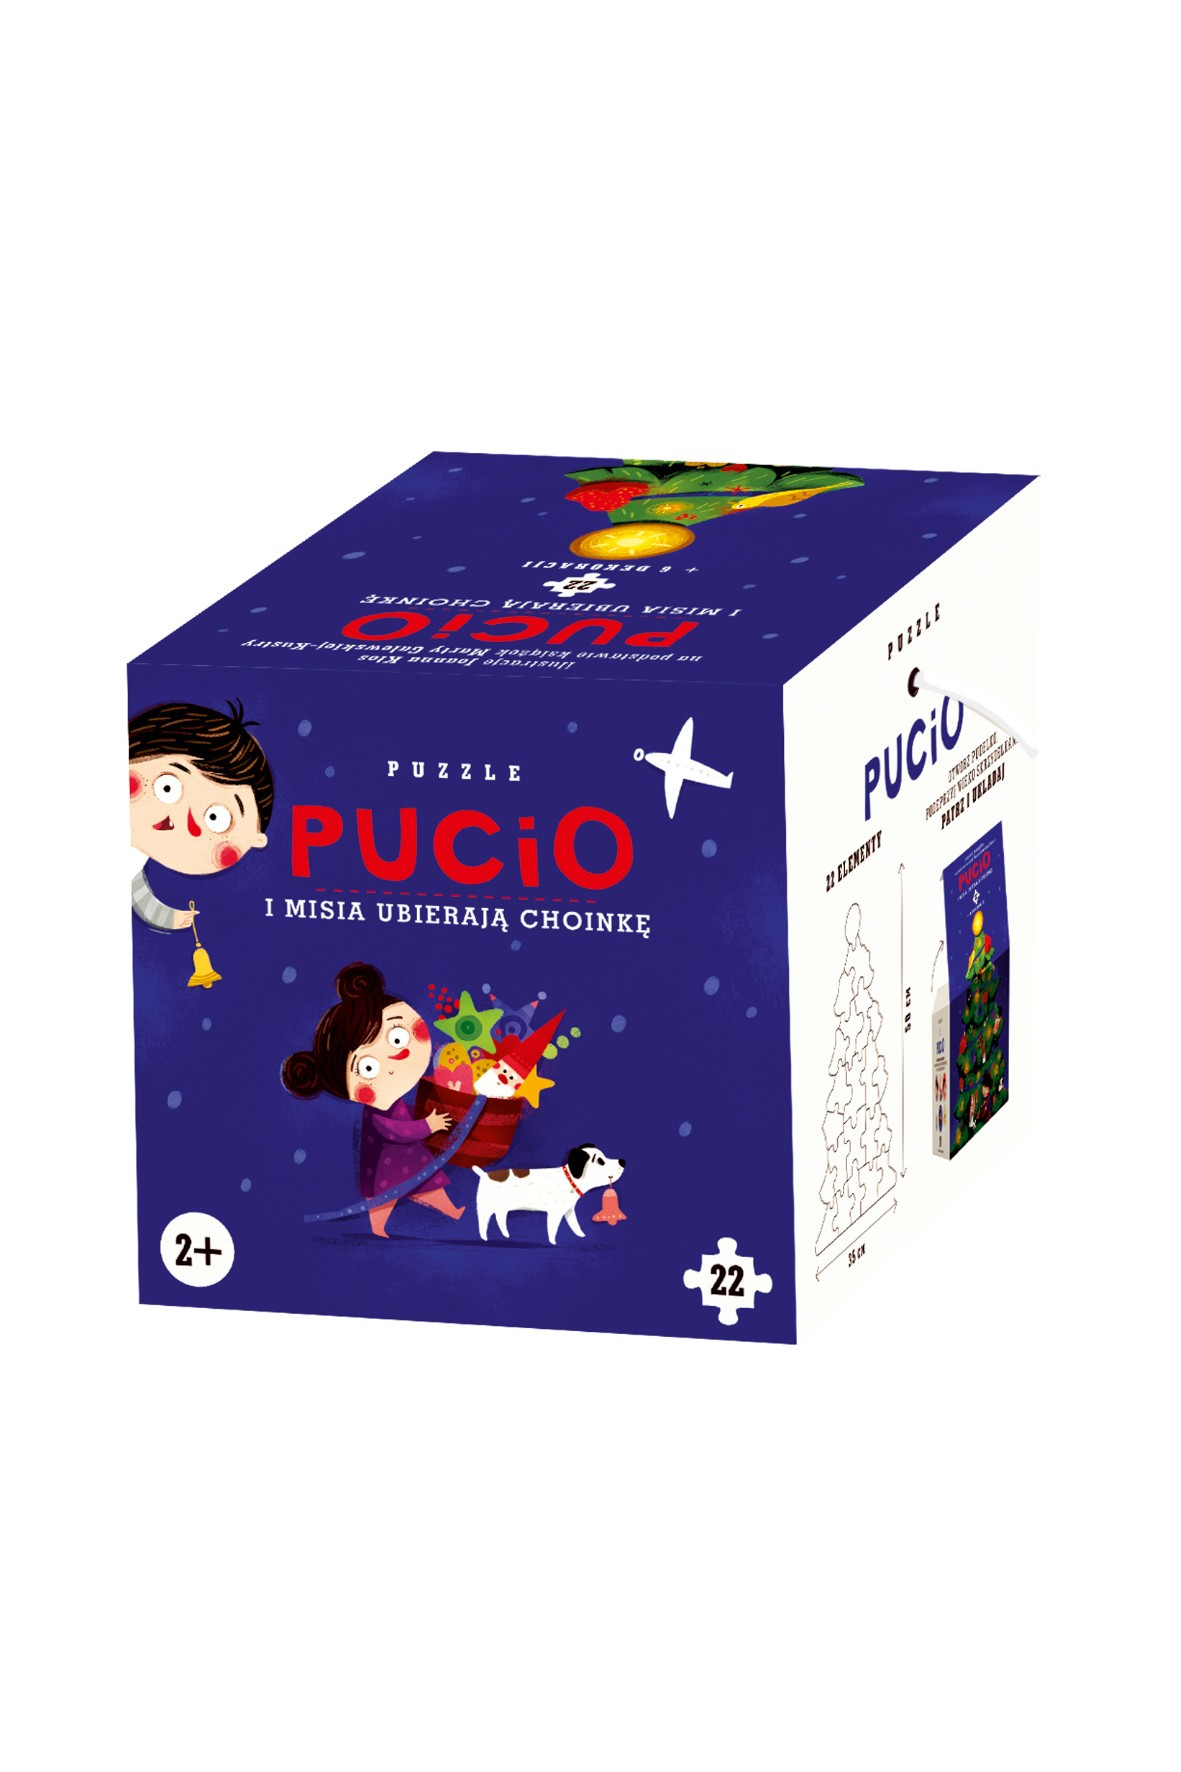 Puzzle Pucio i Misia ubierają choinkę 2+